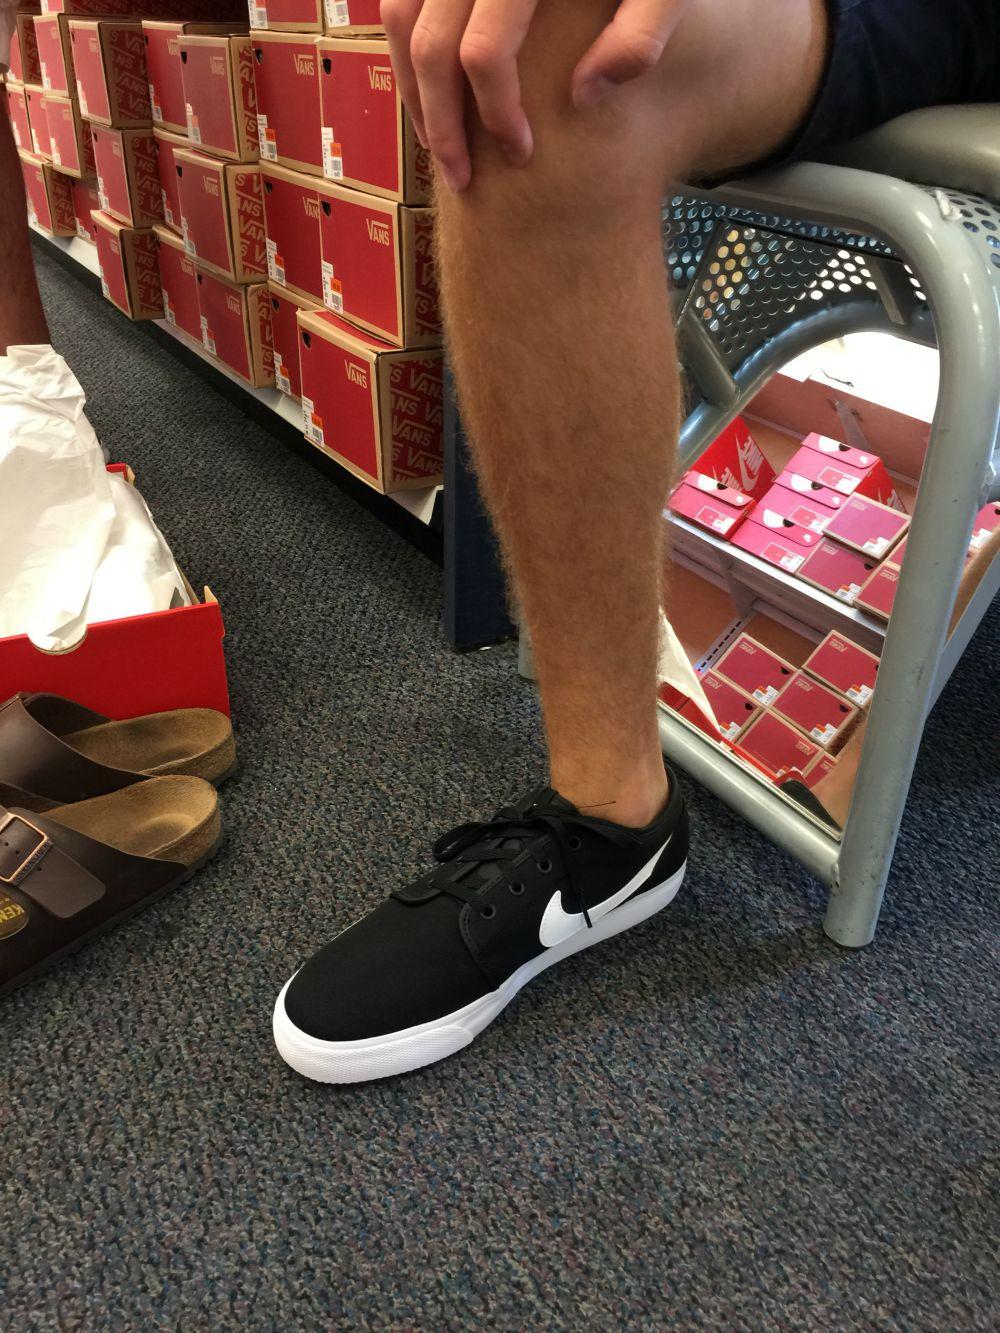 Rack Room Shoes Nike Sandals